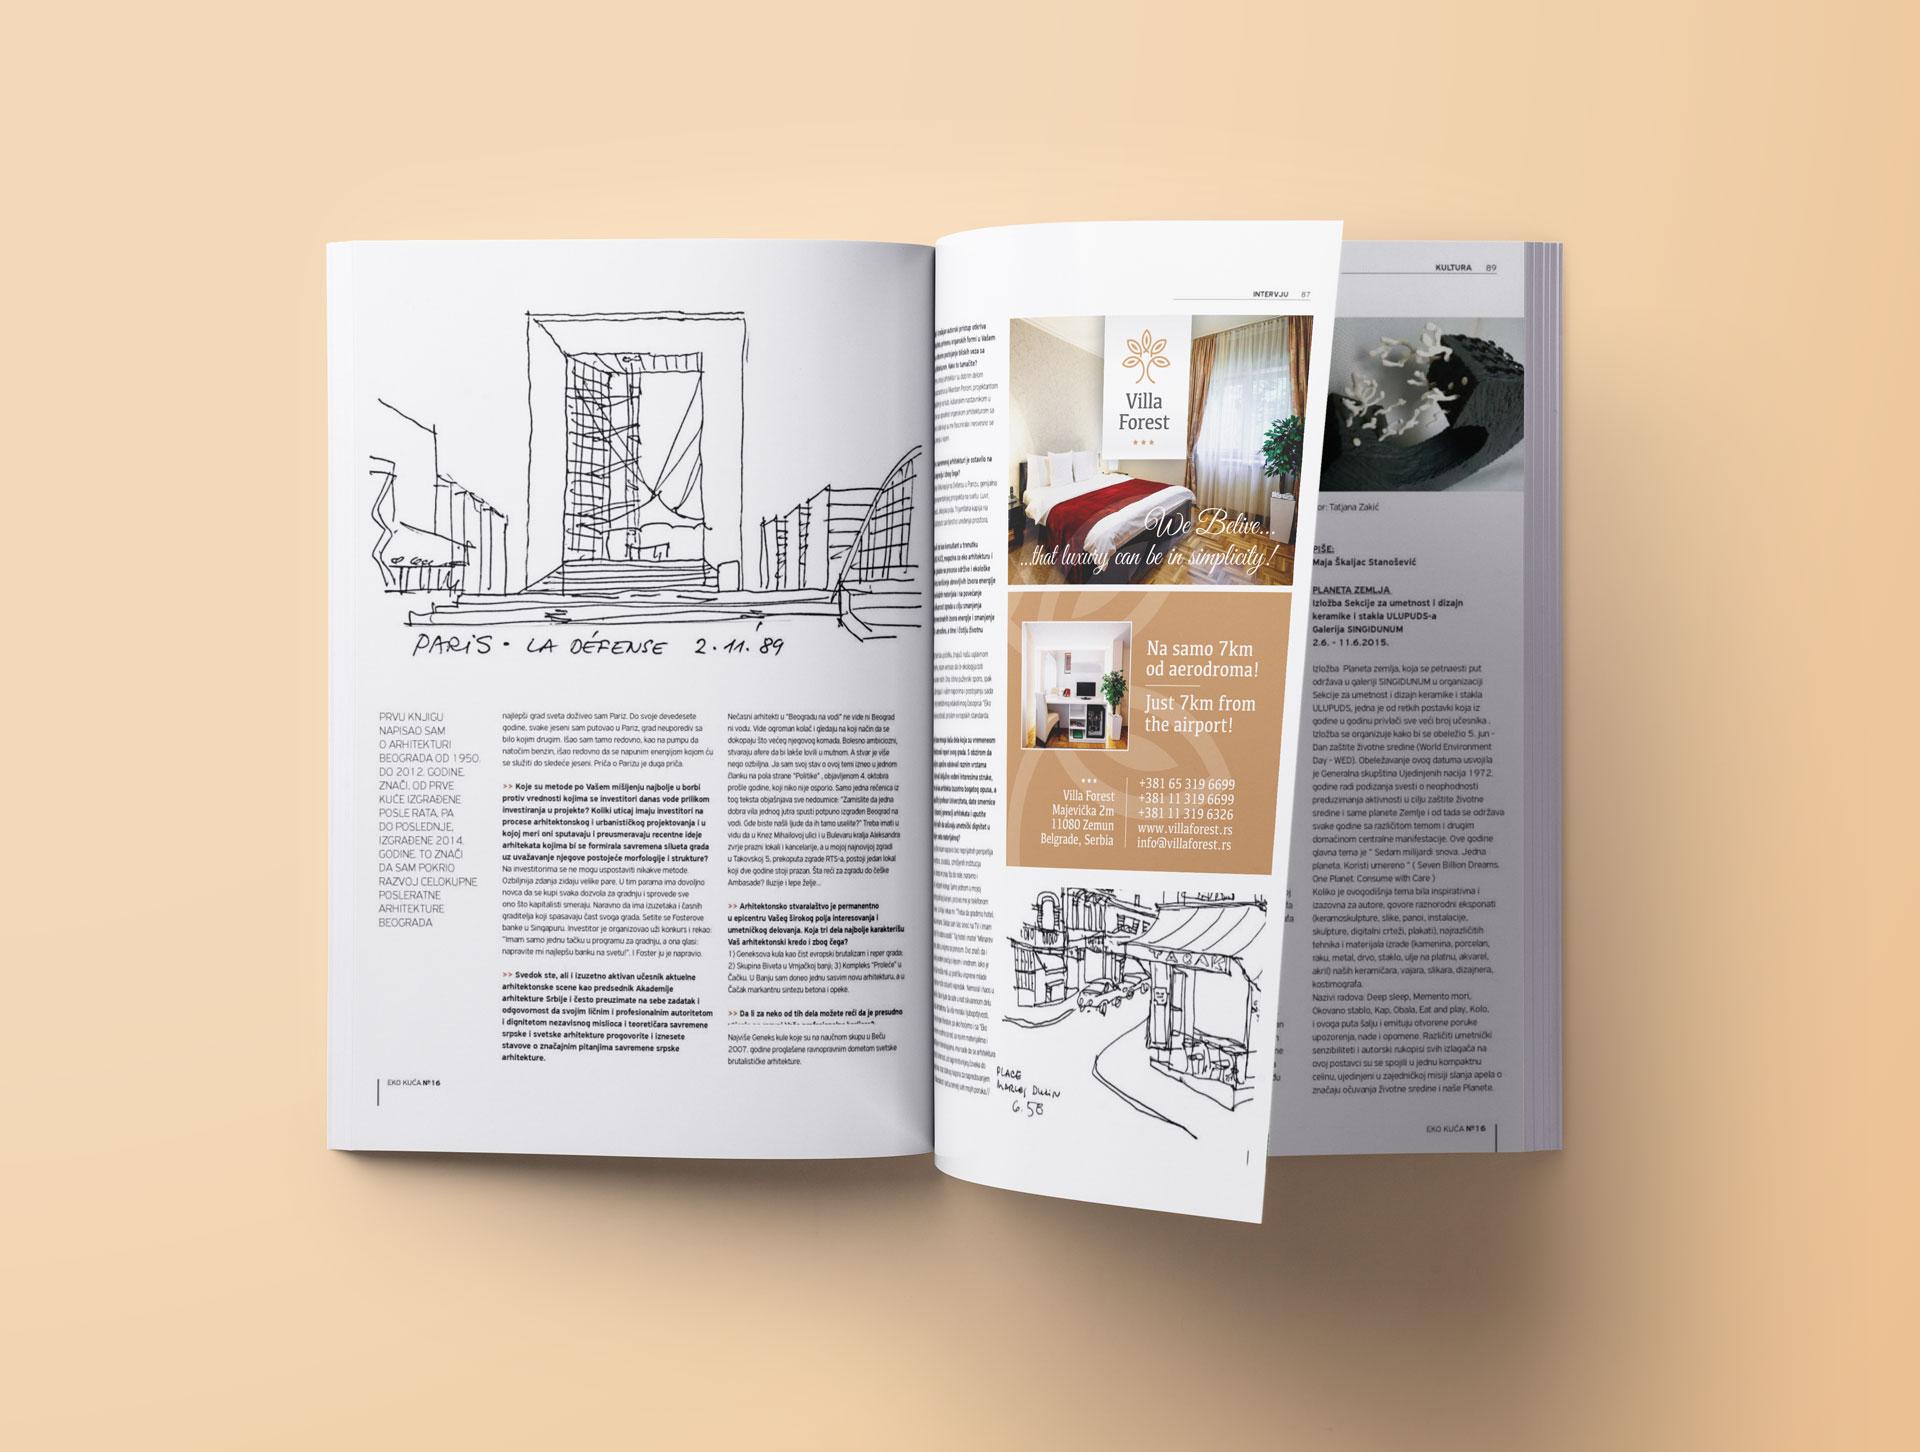 Dizajn novinskog oglasa za apart hotel Villa Forest